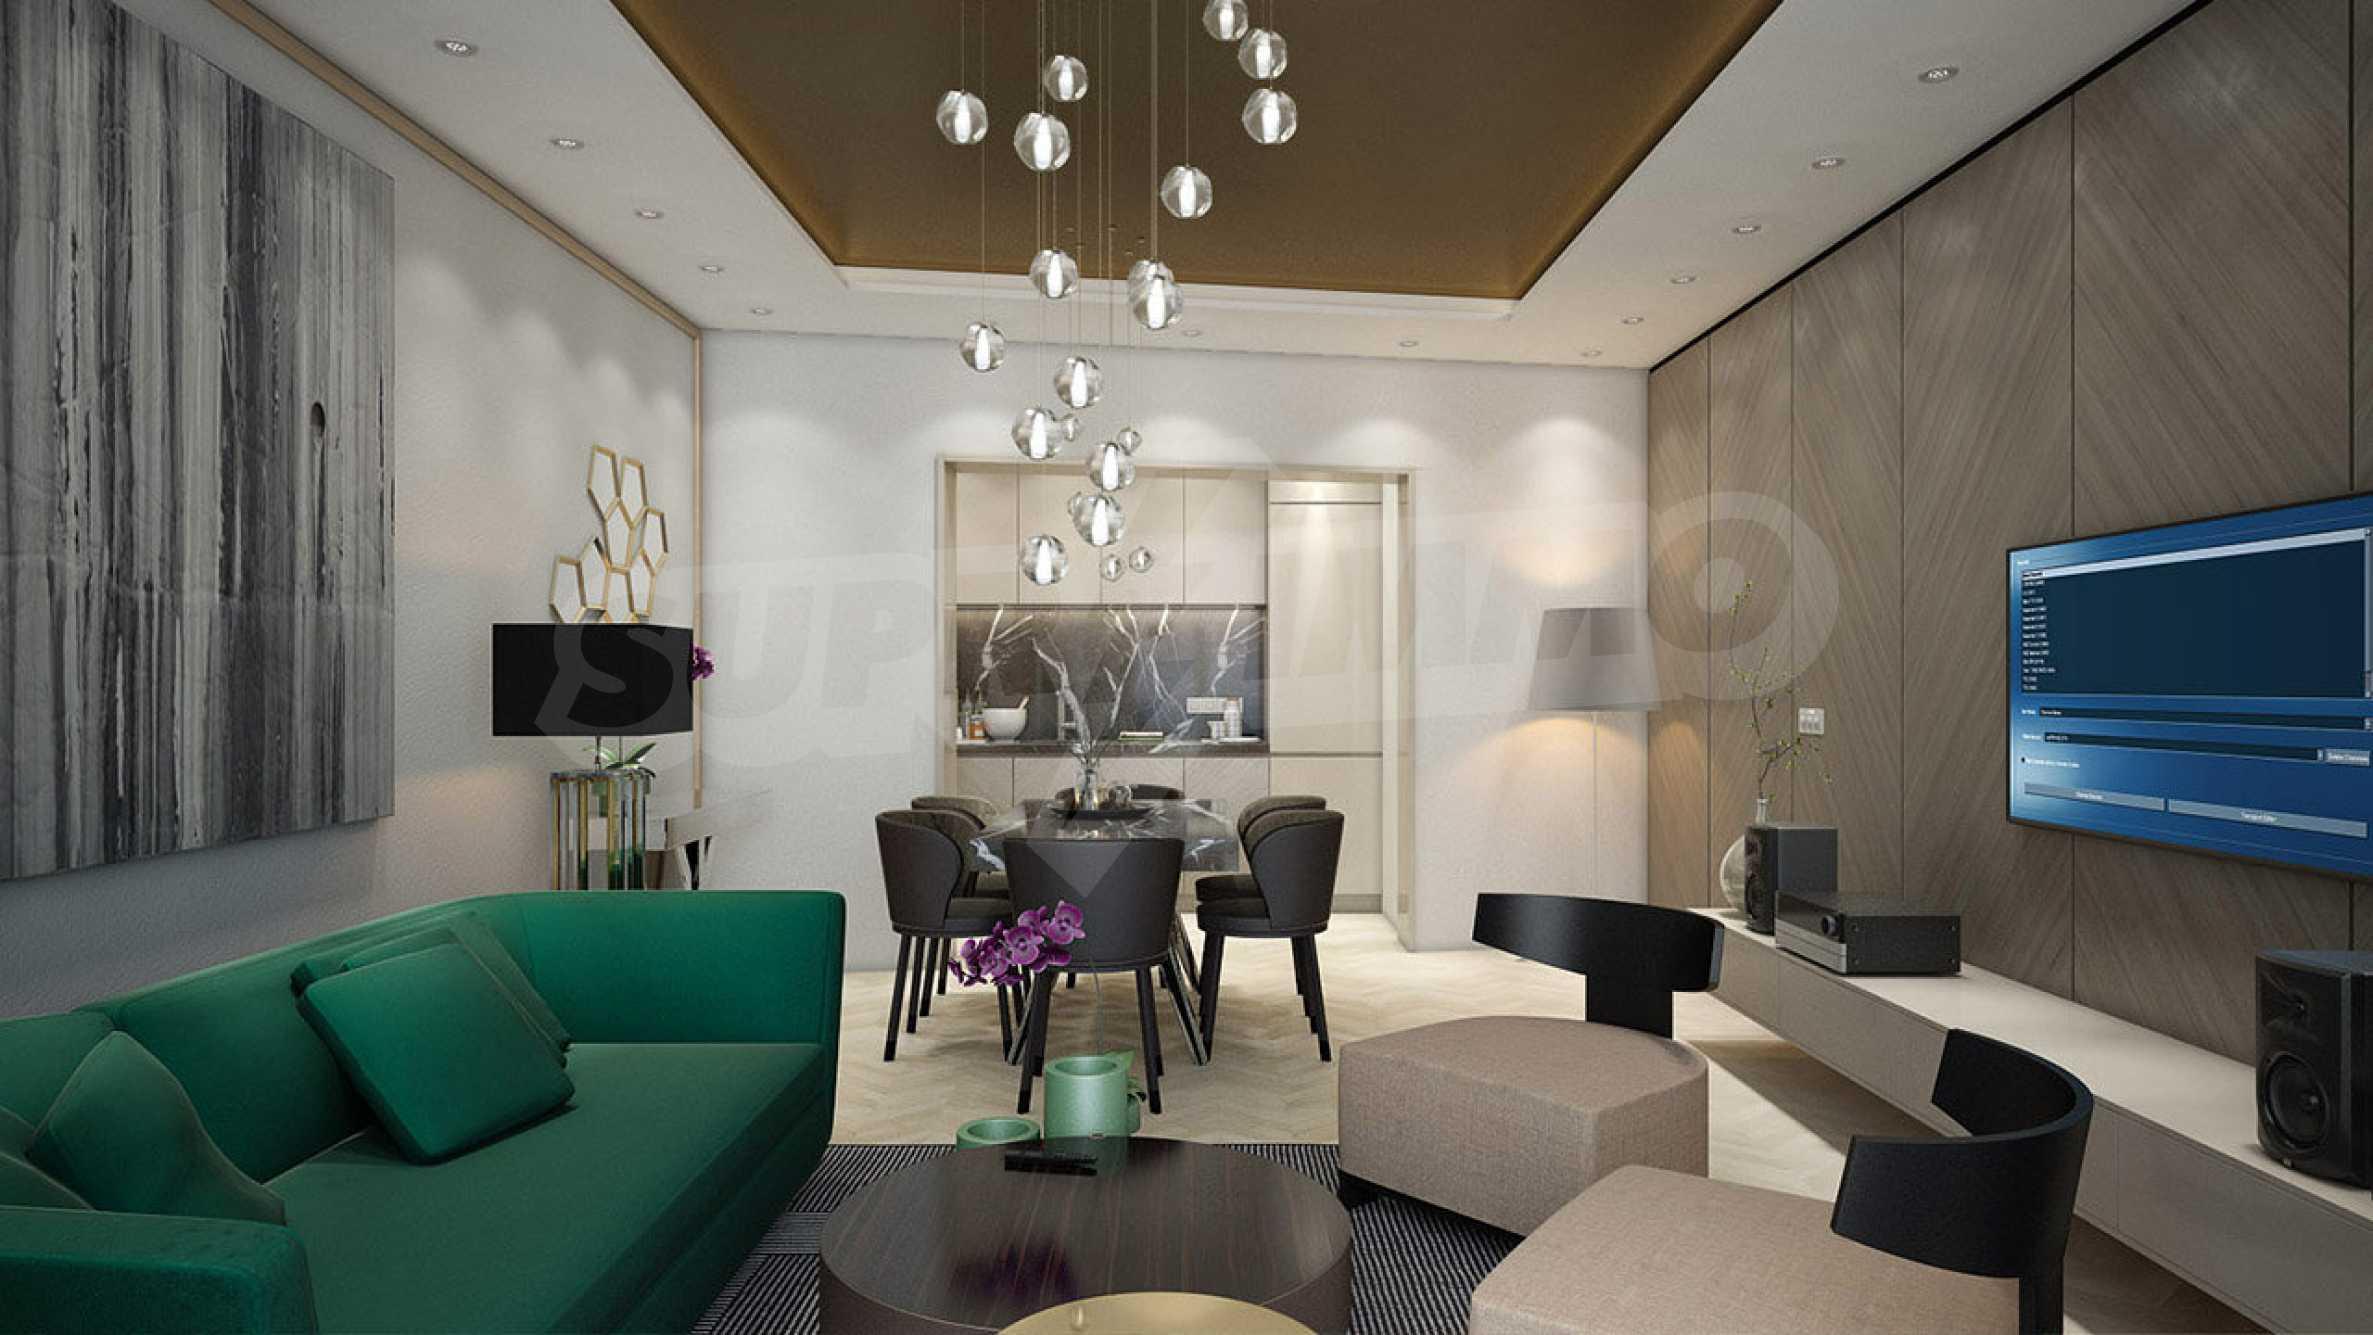 Нова сграда с луксозни апартаменти в гр. Бургас 46